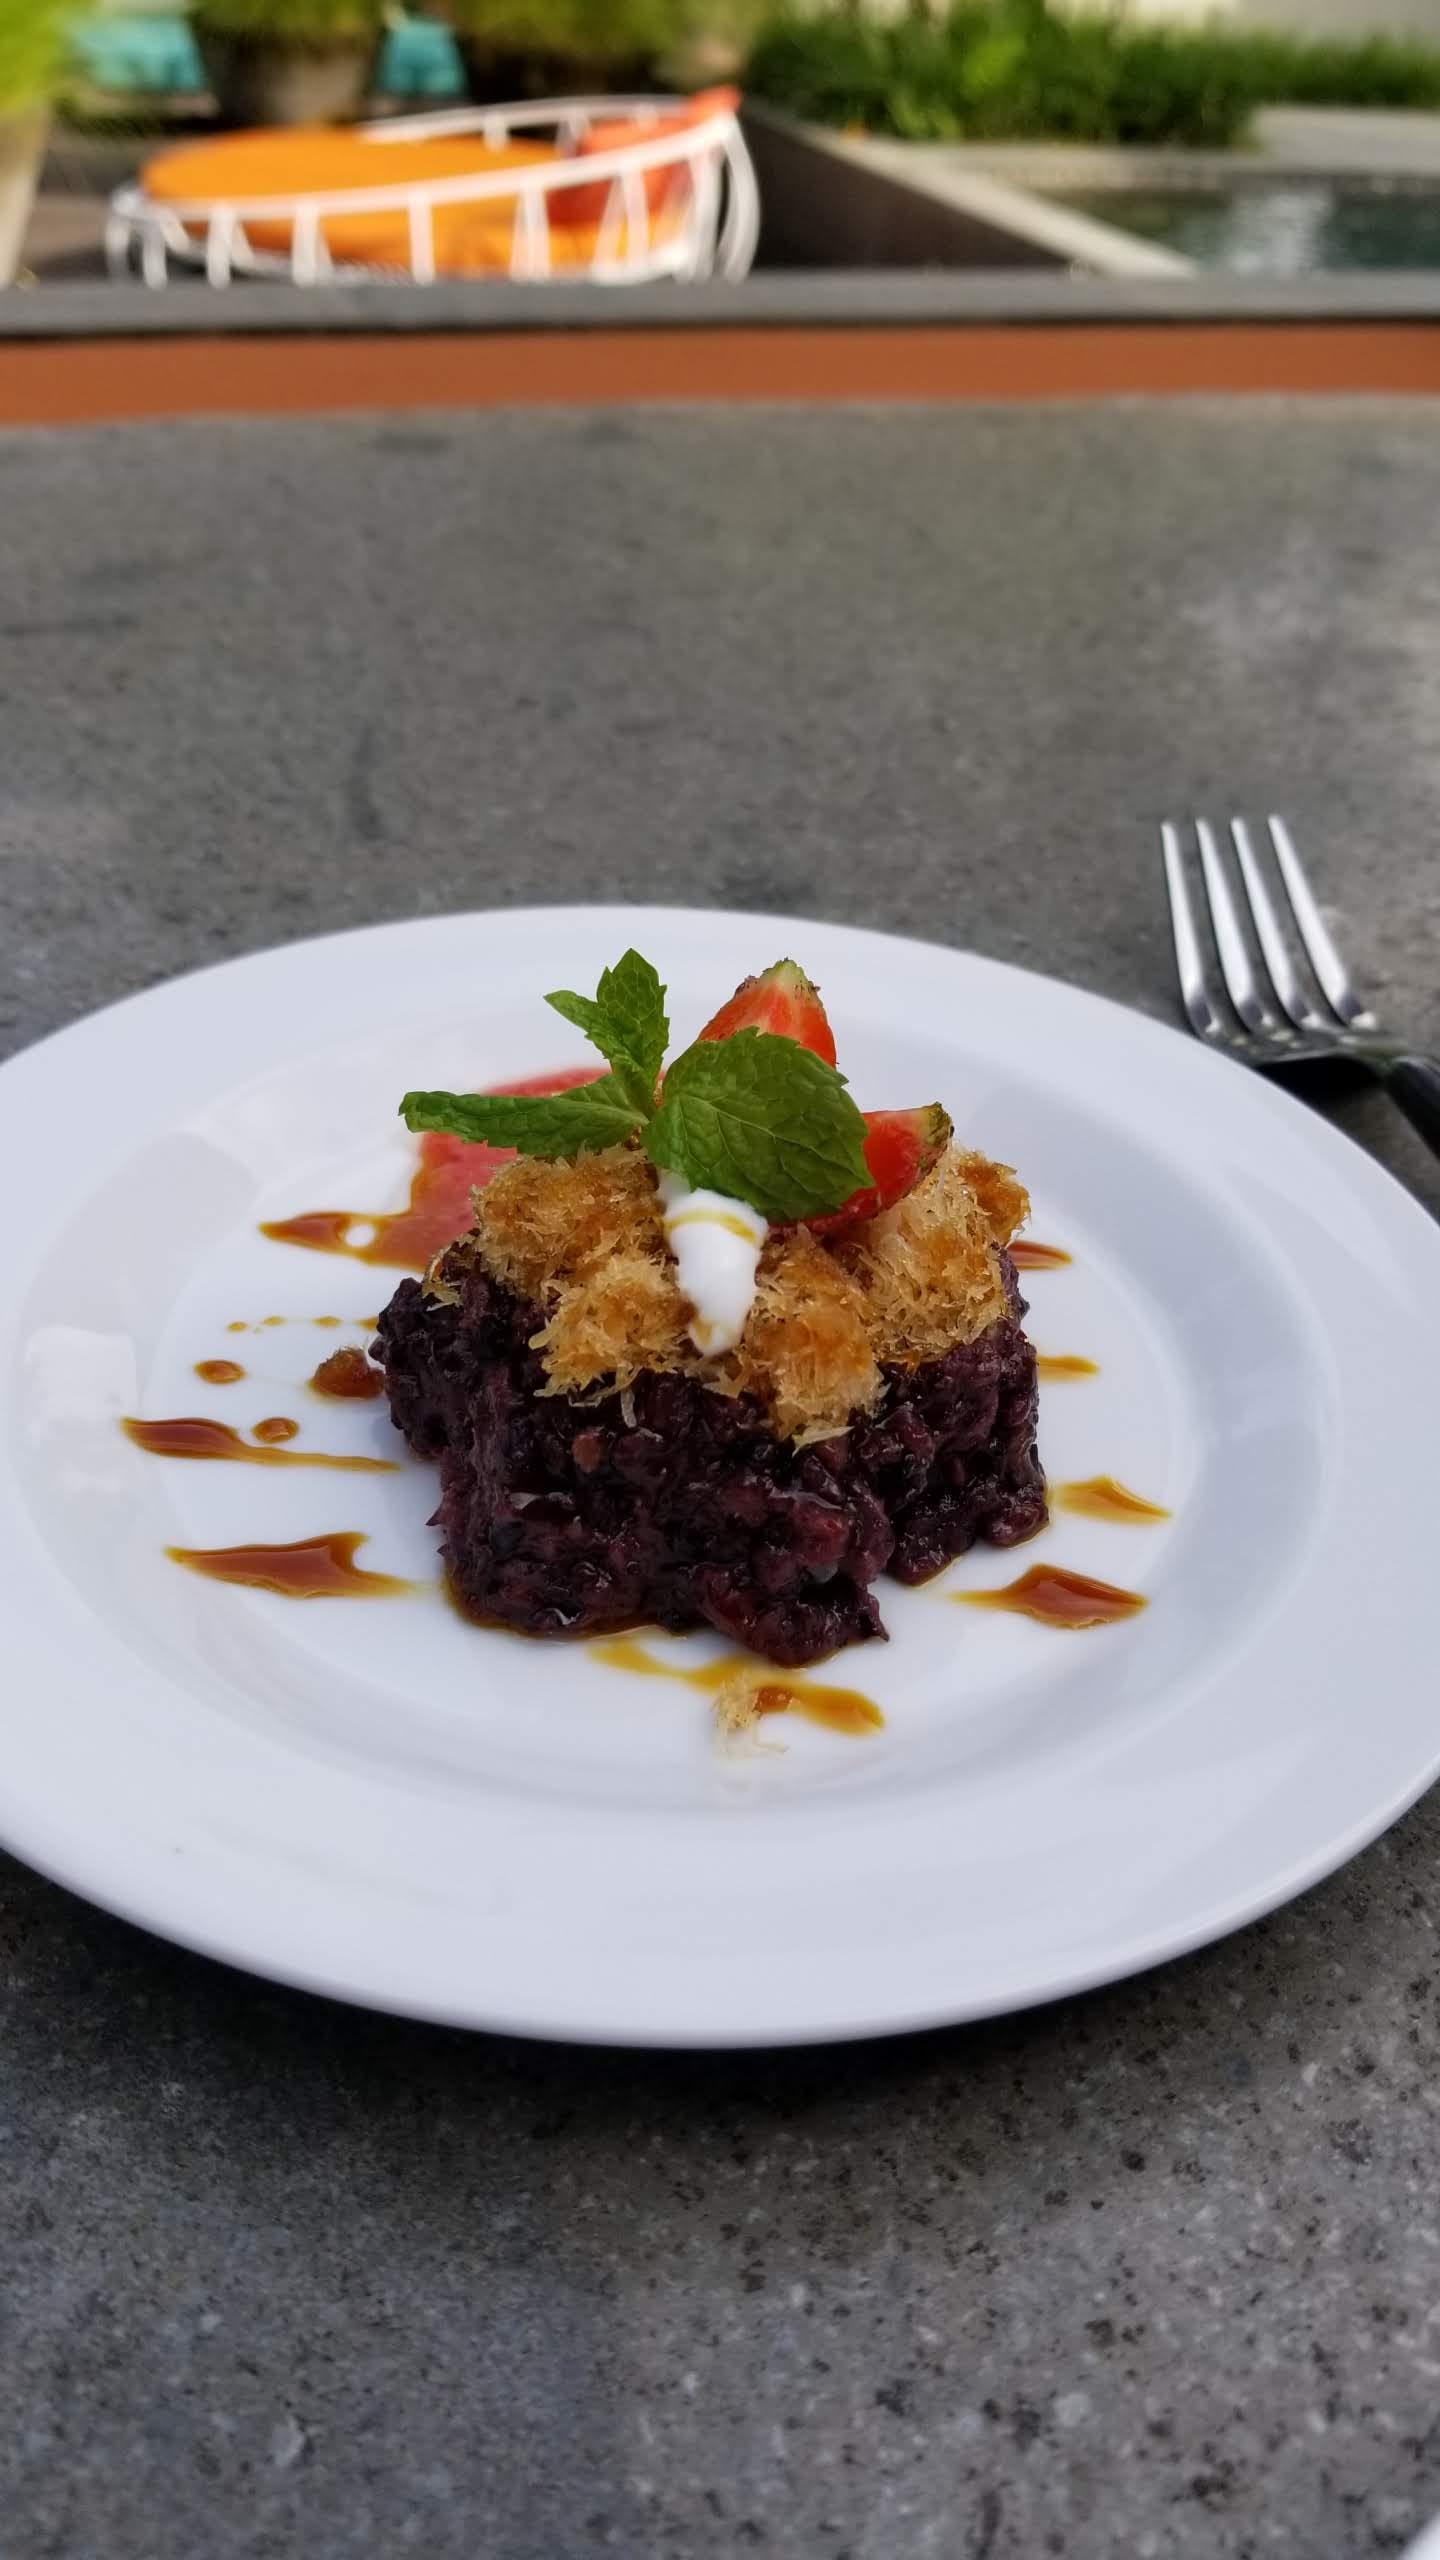 Black rice dessert served at tea time